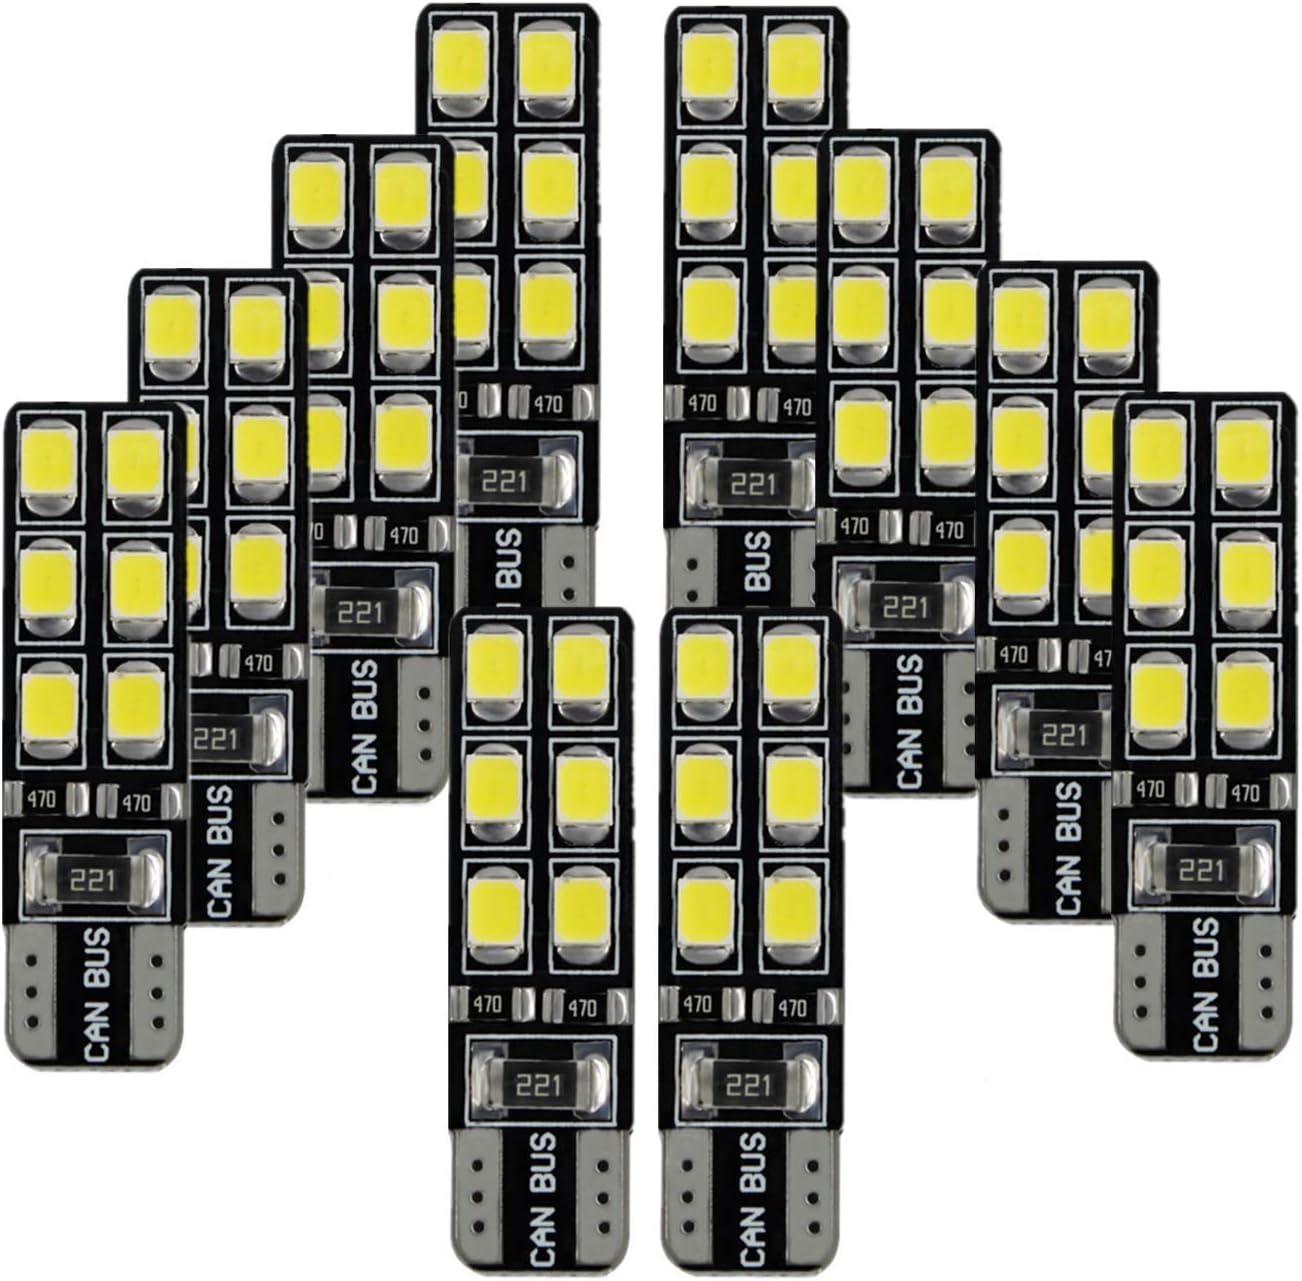 FEZZ Luces Interior Led Coche Canbus Bombillas Posicion Led Blancas Luz T10 W5W Laterales Iluminación, 10 Pack